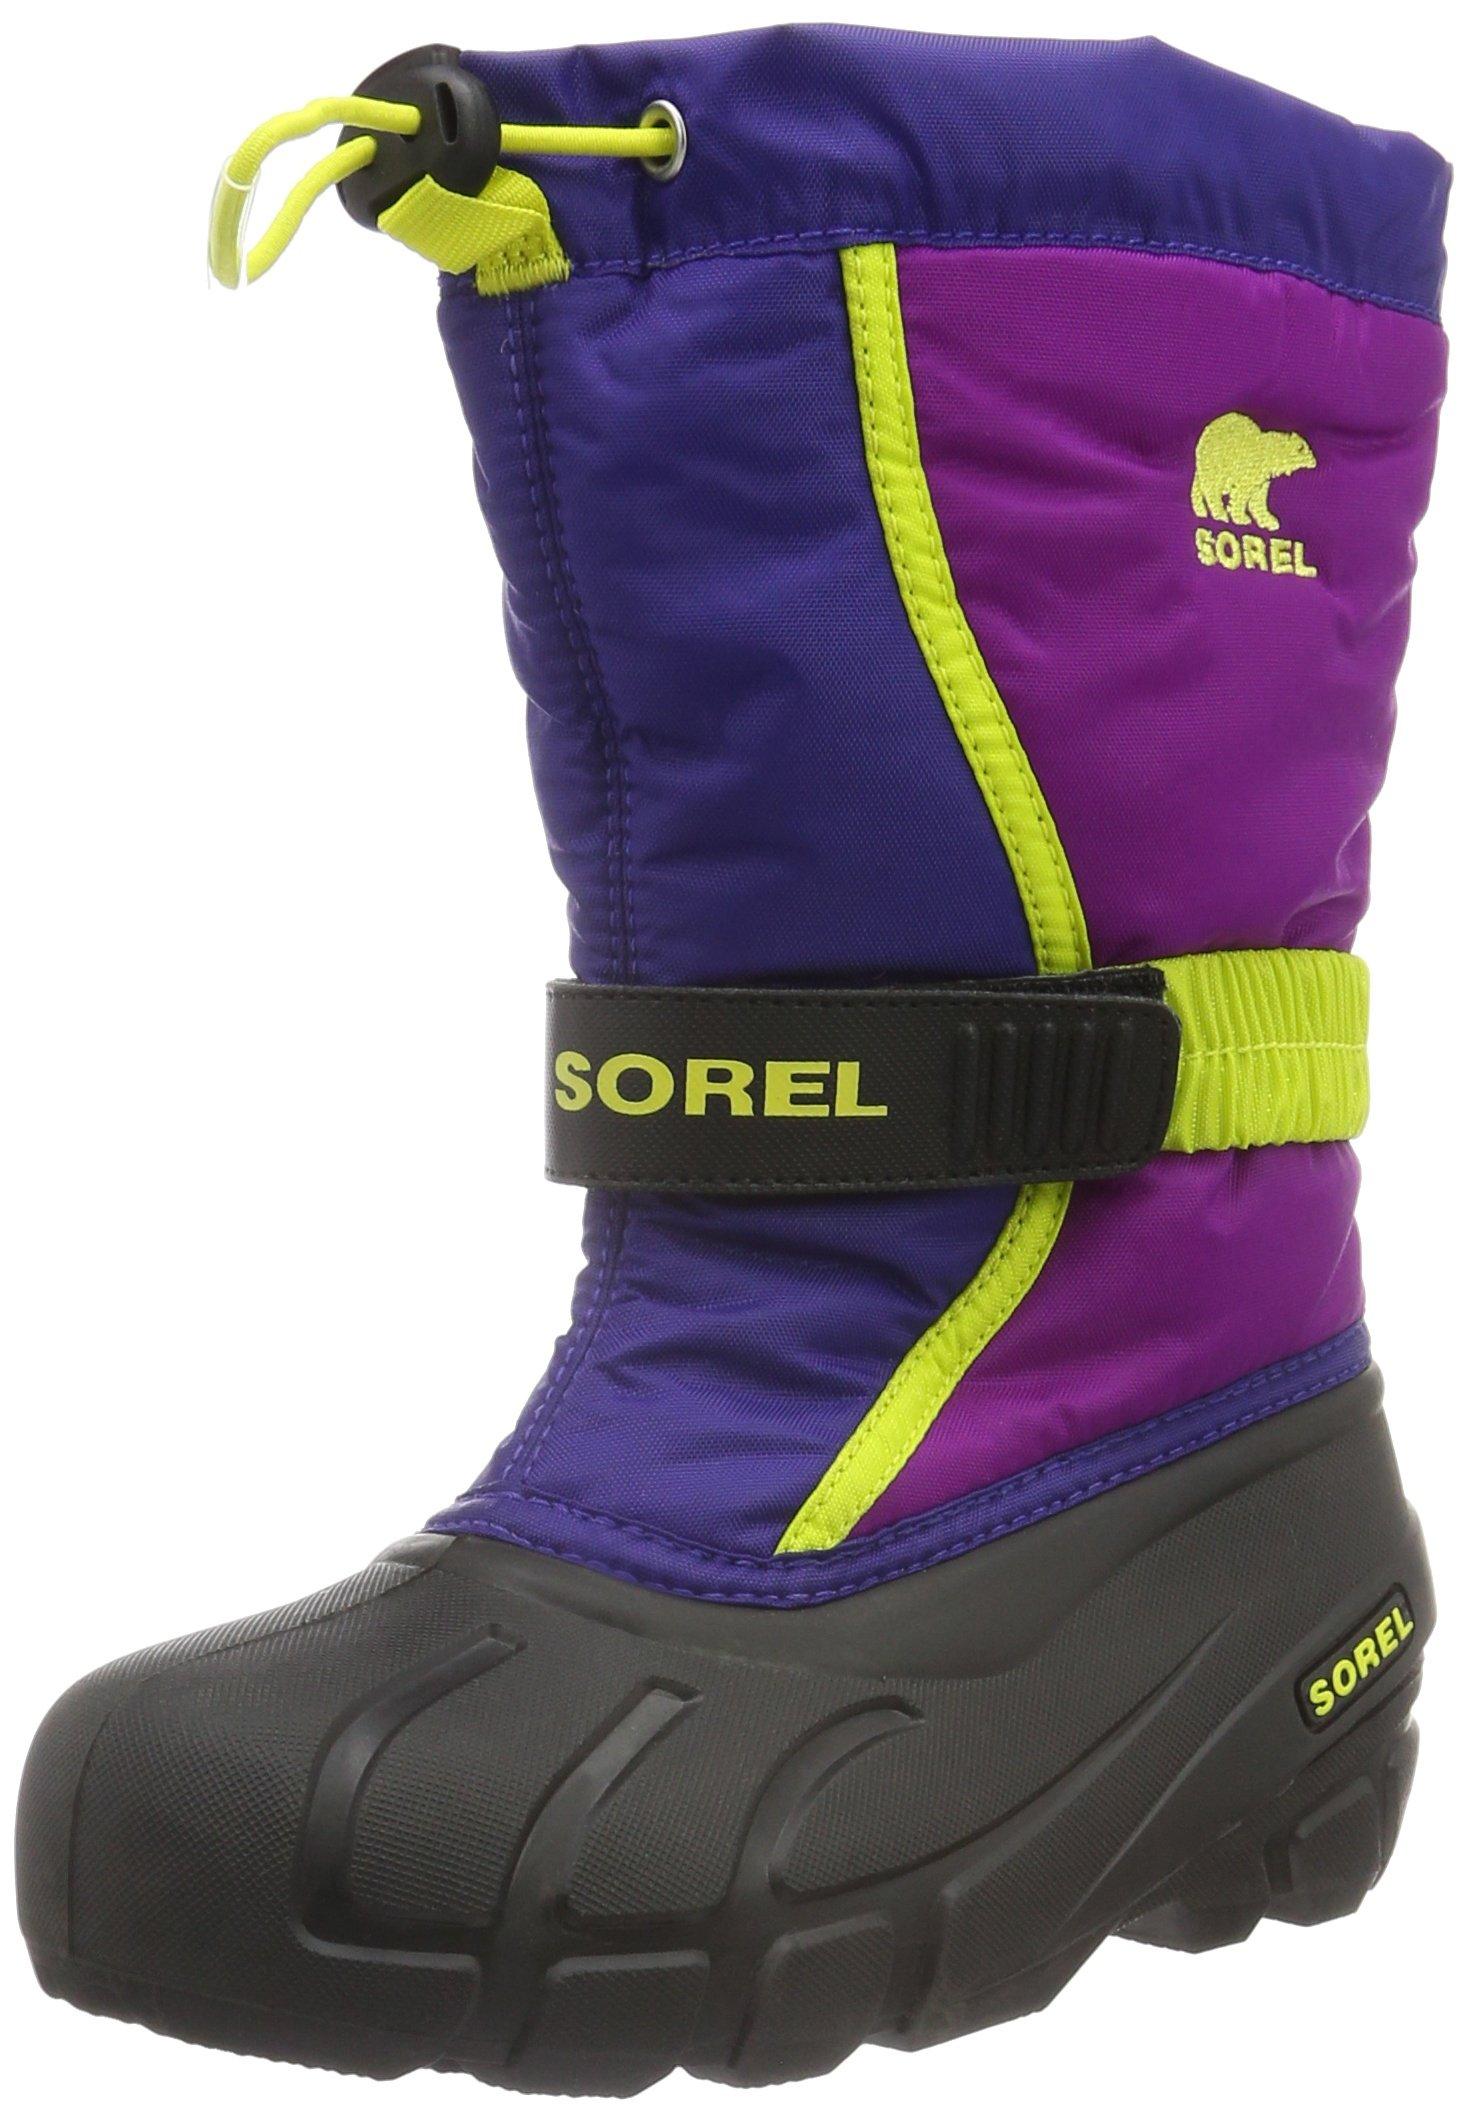 Sorel Youth Flurry-K Snow Boot, Blue, 2 M US Little Kid